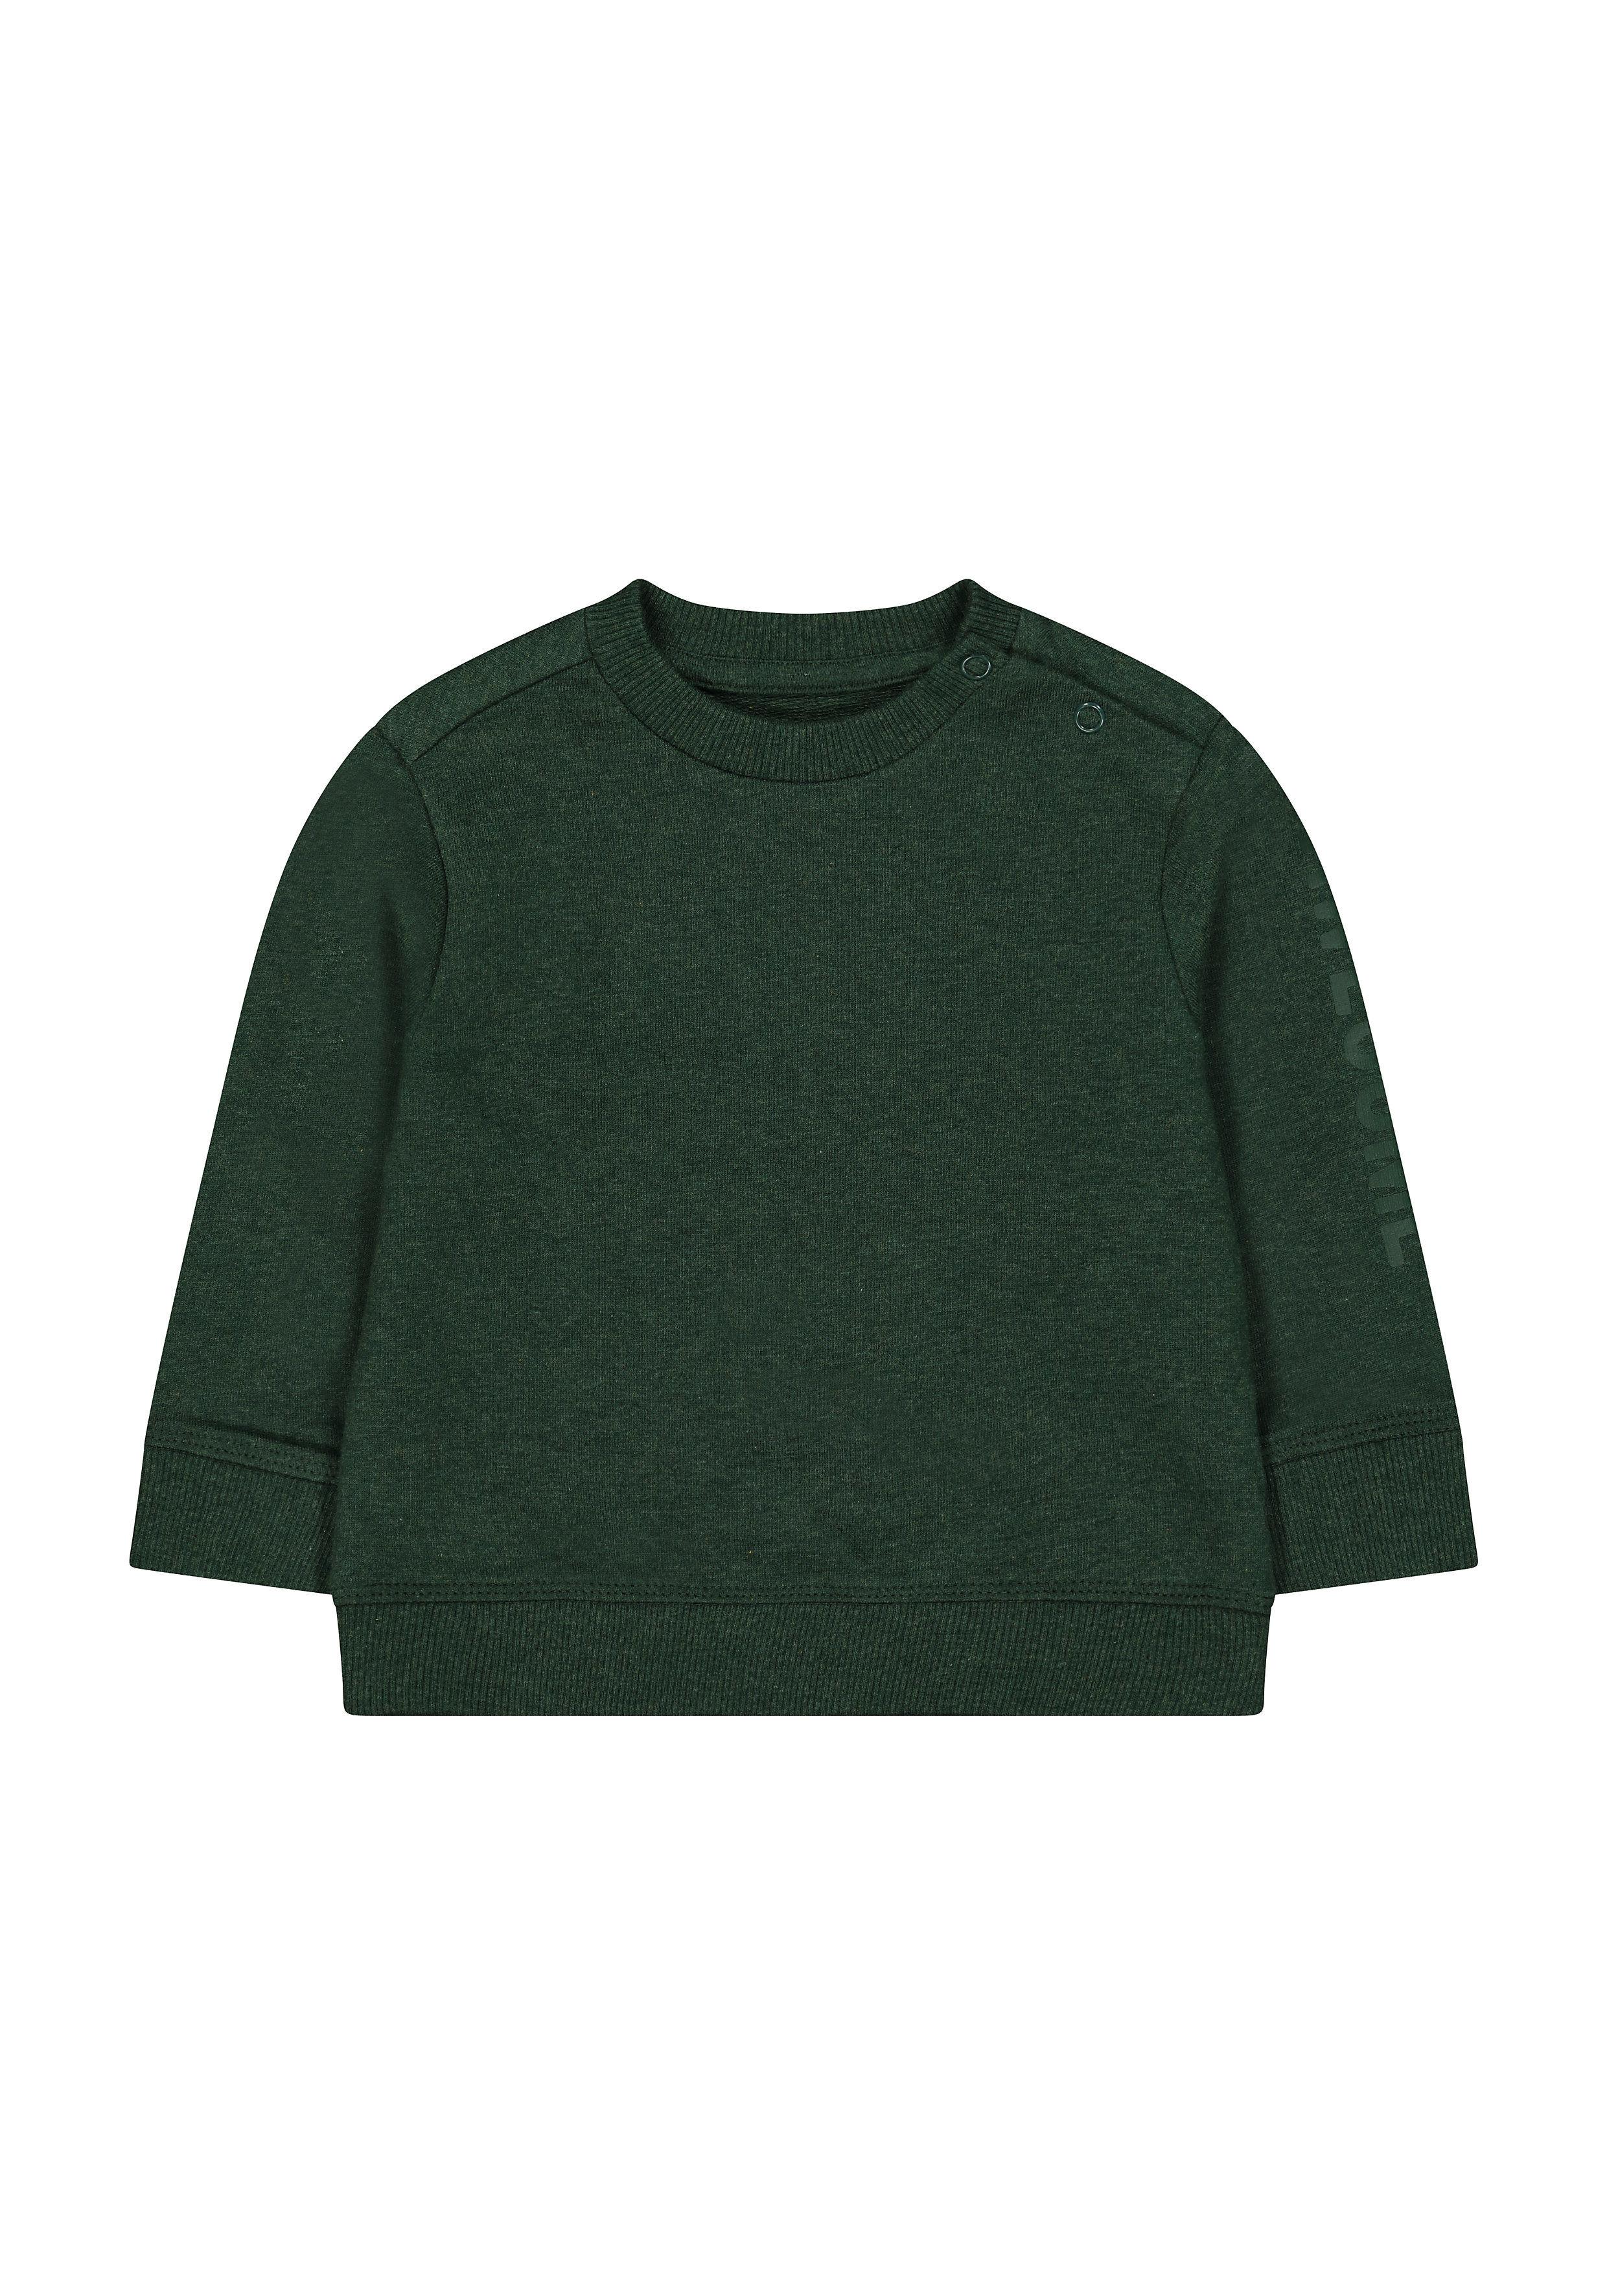 Mothercare | Boys Full Sleeves Sweatshirt Text Print - Green